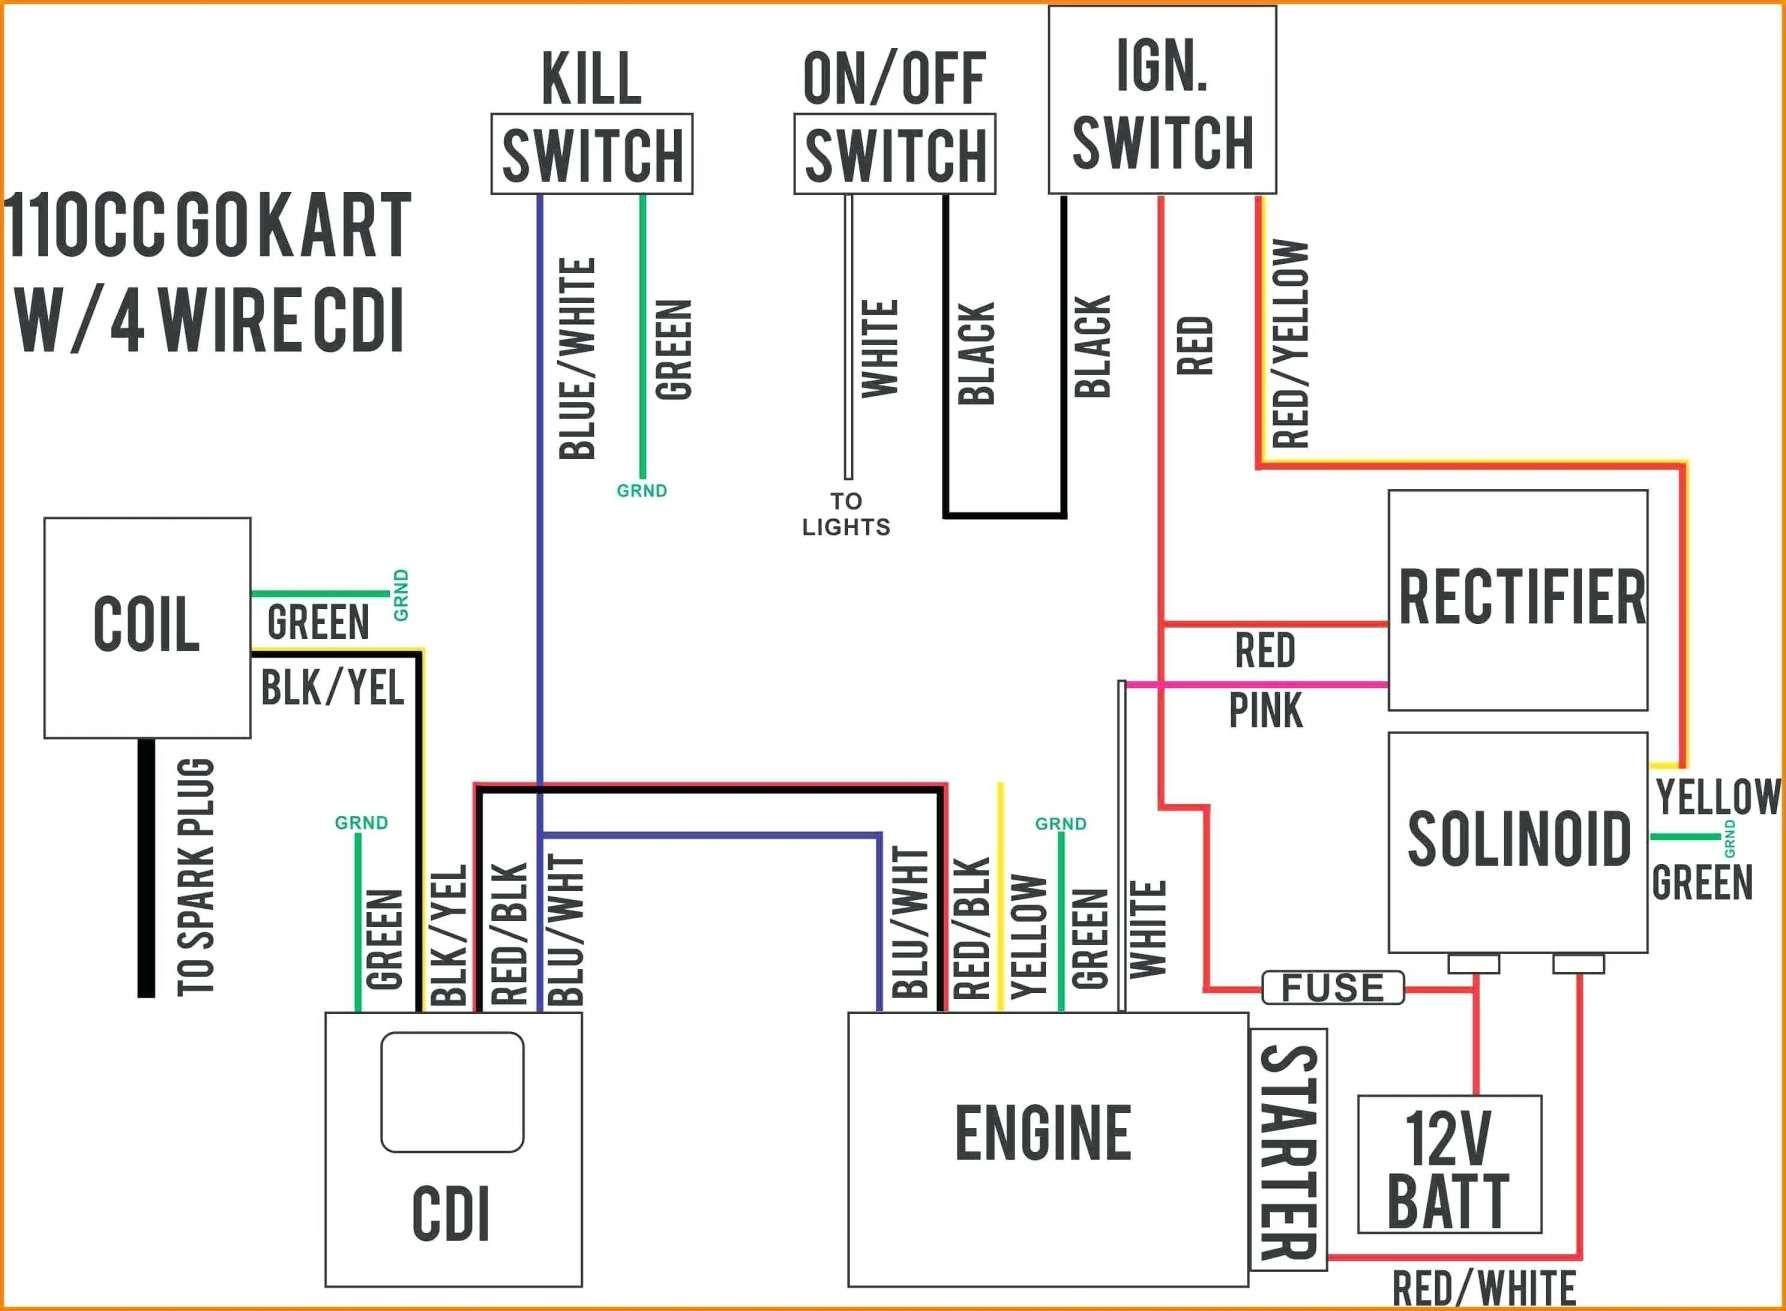 16 Motorcycle Stator Winding Diagram Motorcycle Diagram Wiringg Net Electrical Wiring Diagram Motorcycle Wiring Electrical Diagram